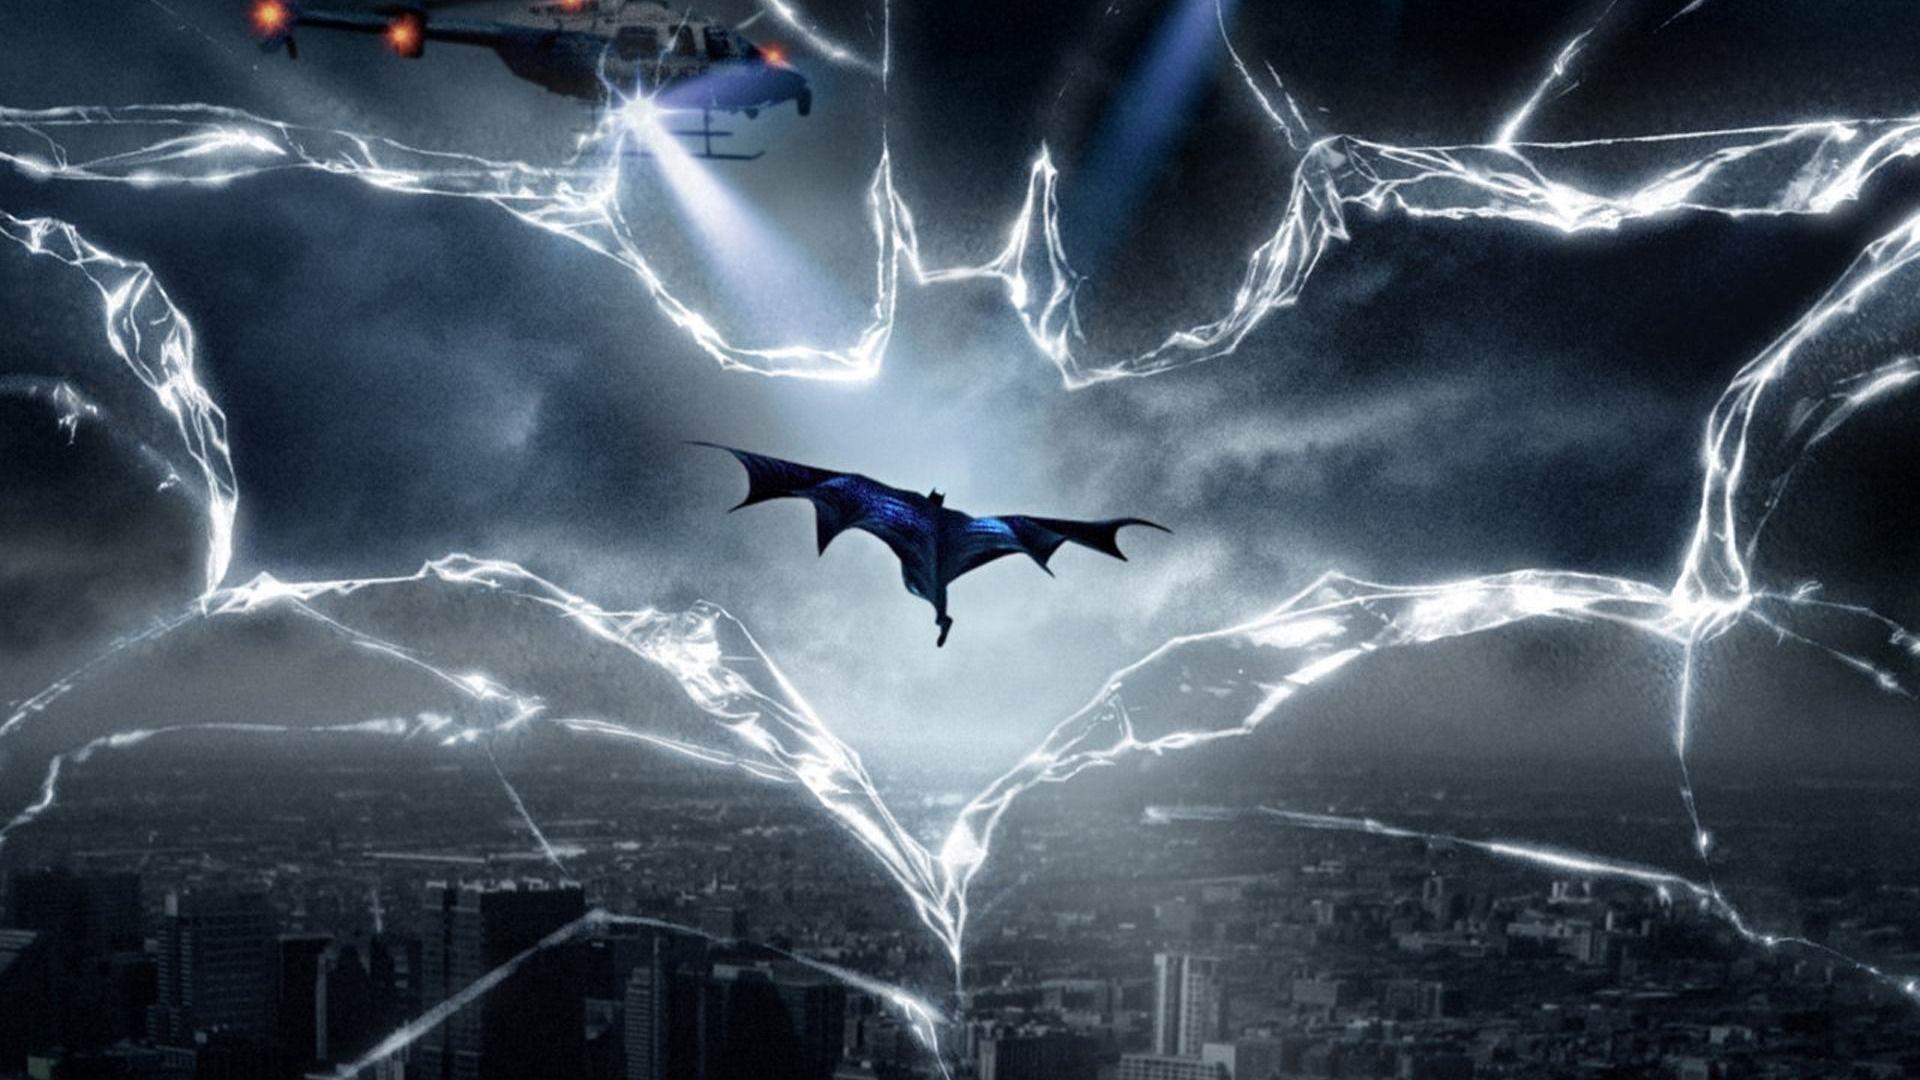 The Dark Knight Rises Wallpapers HD 1920x1080 - Wallpaper Cave